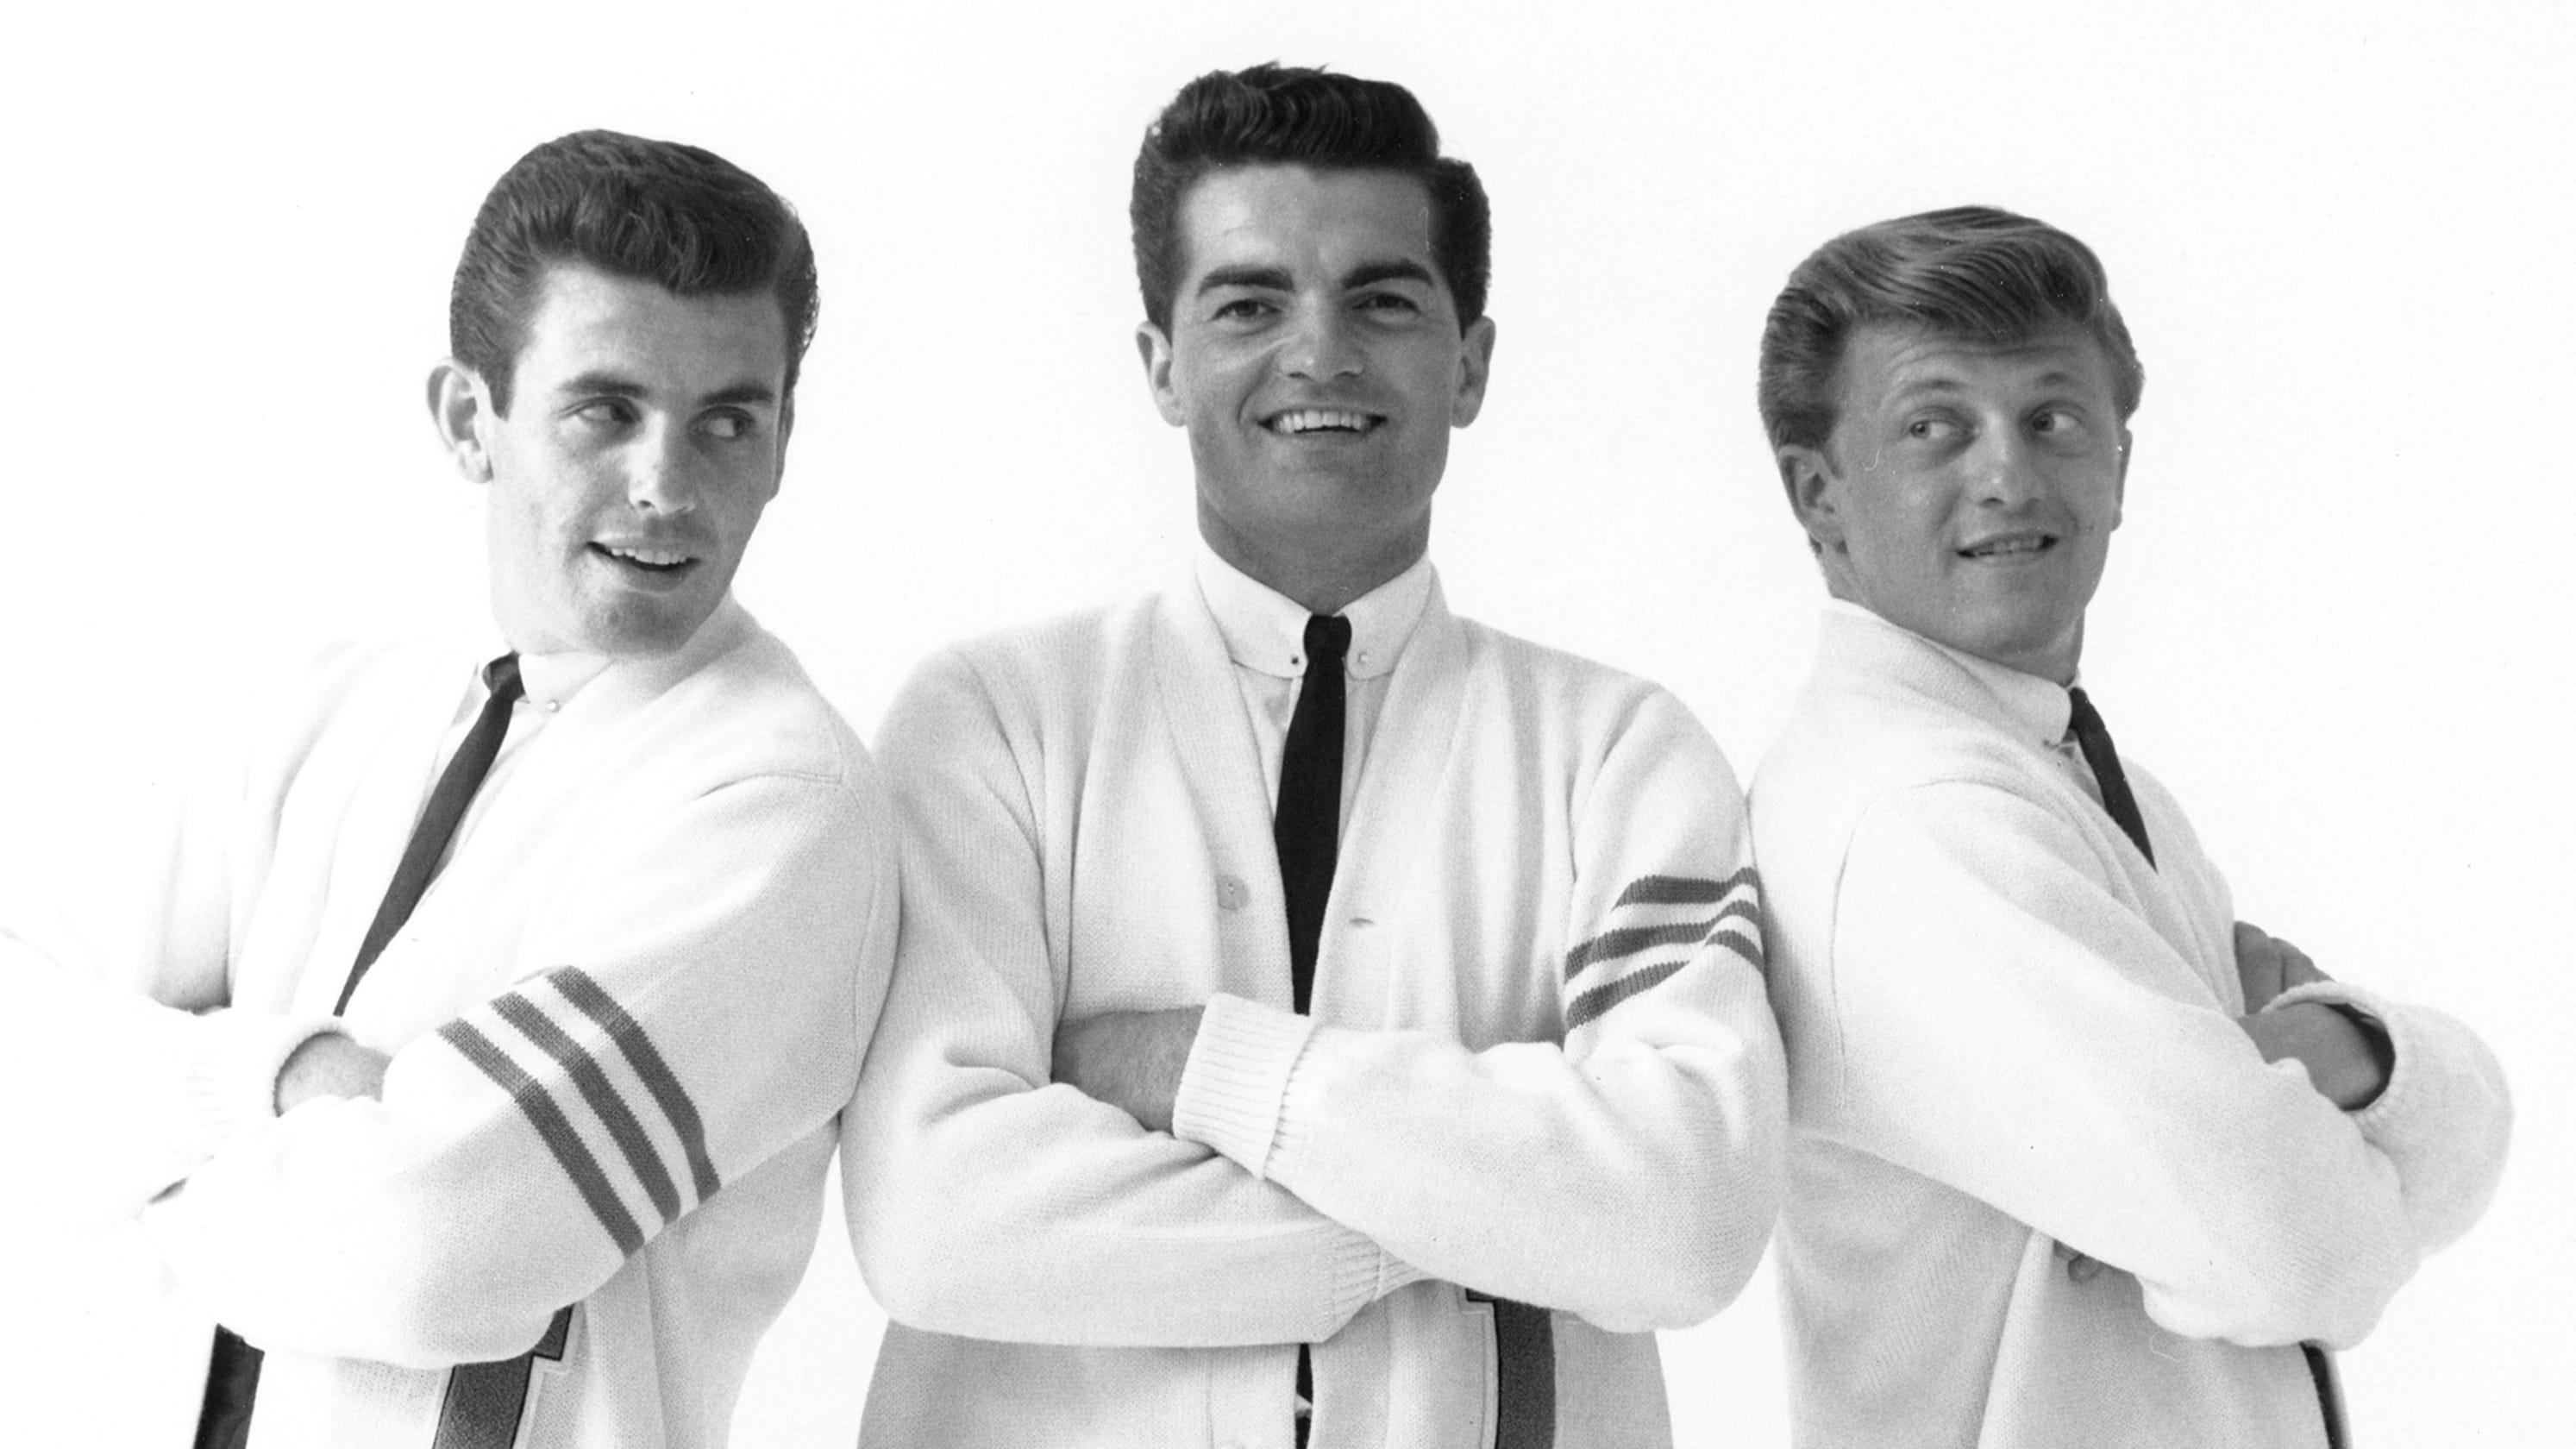 Jim Pike, founding member of the Lettermen vocal trio, dies